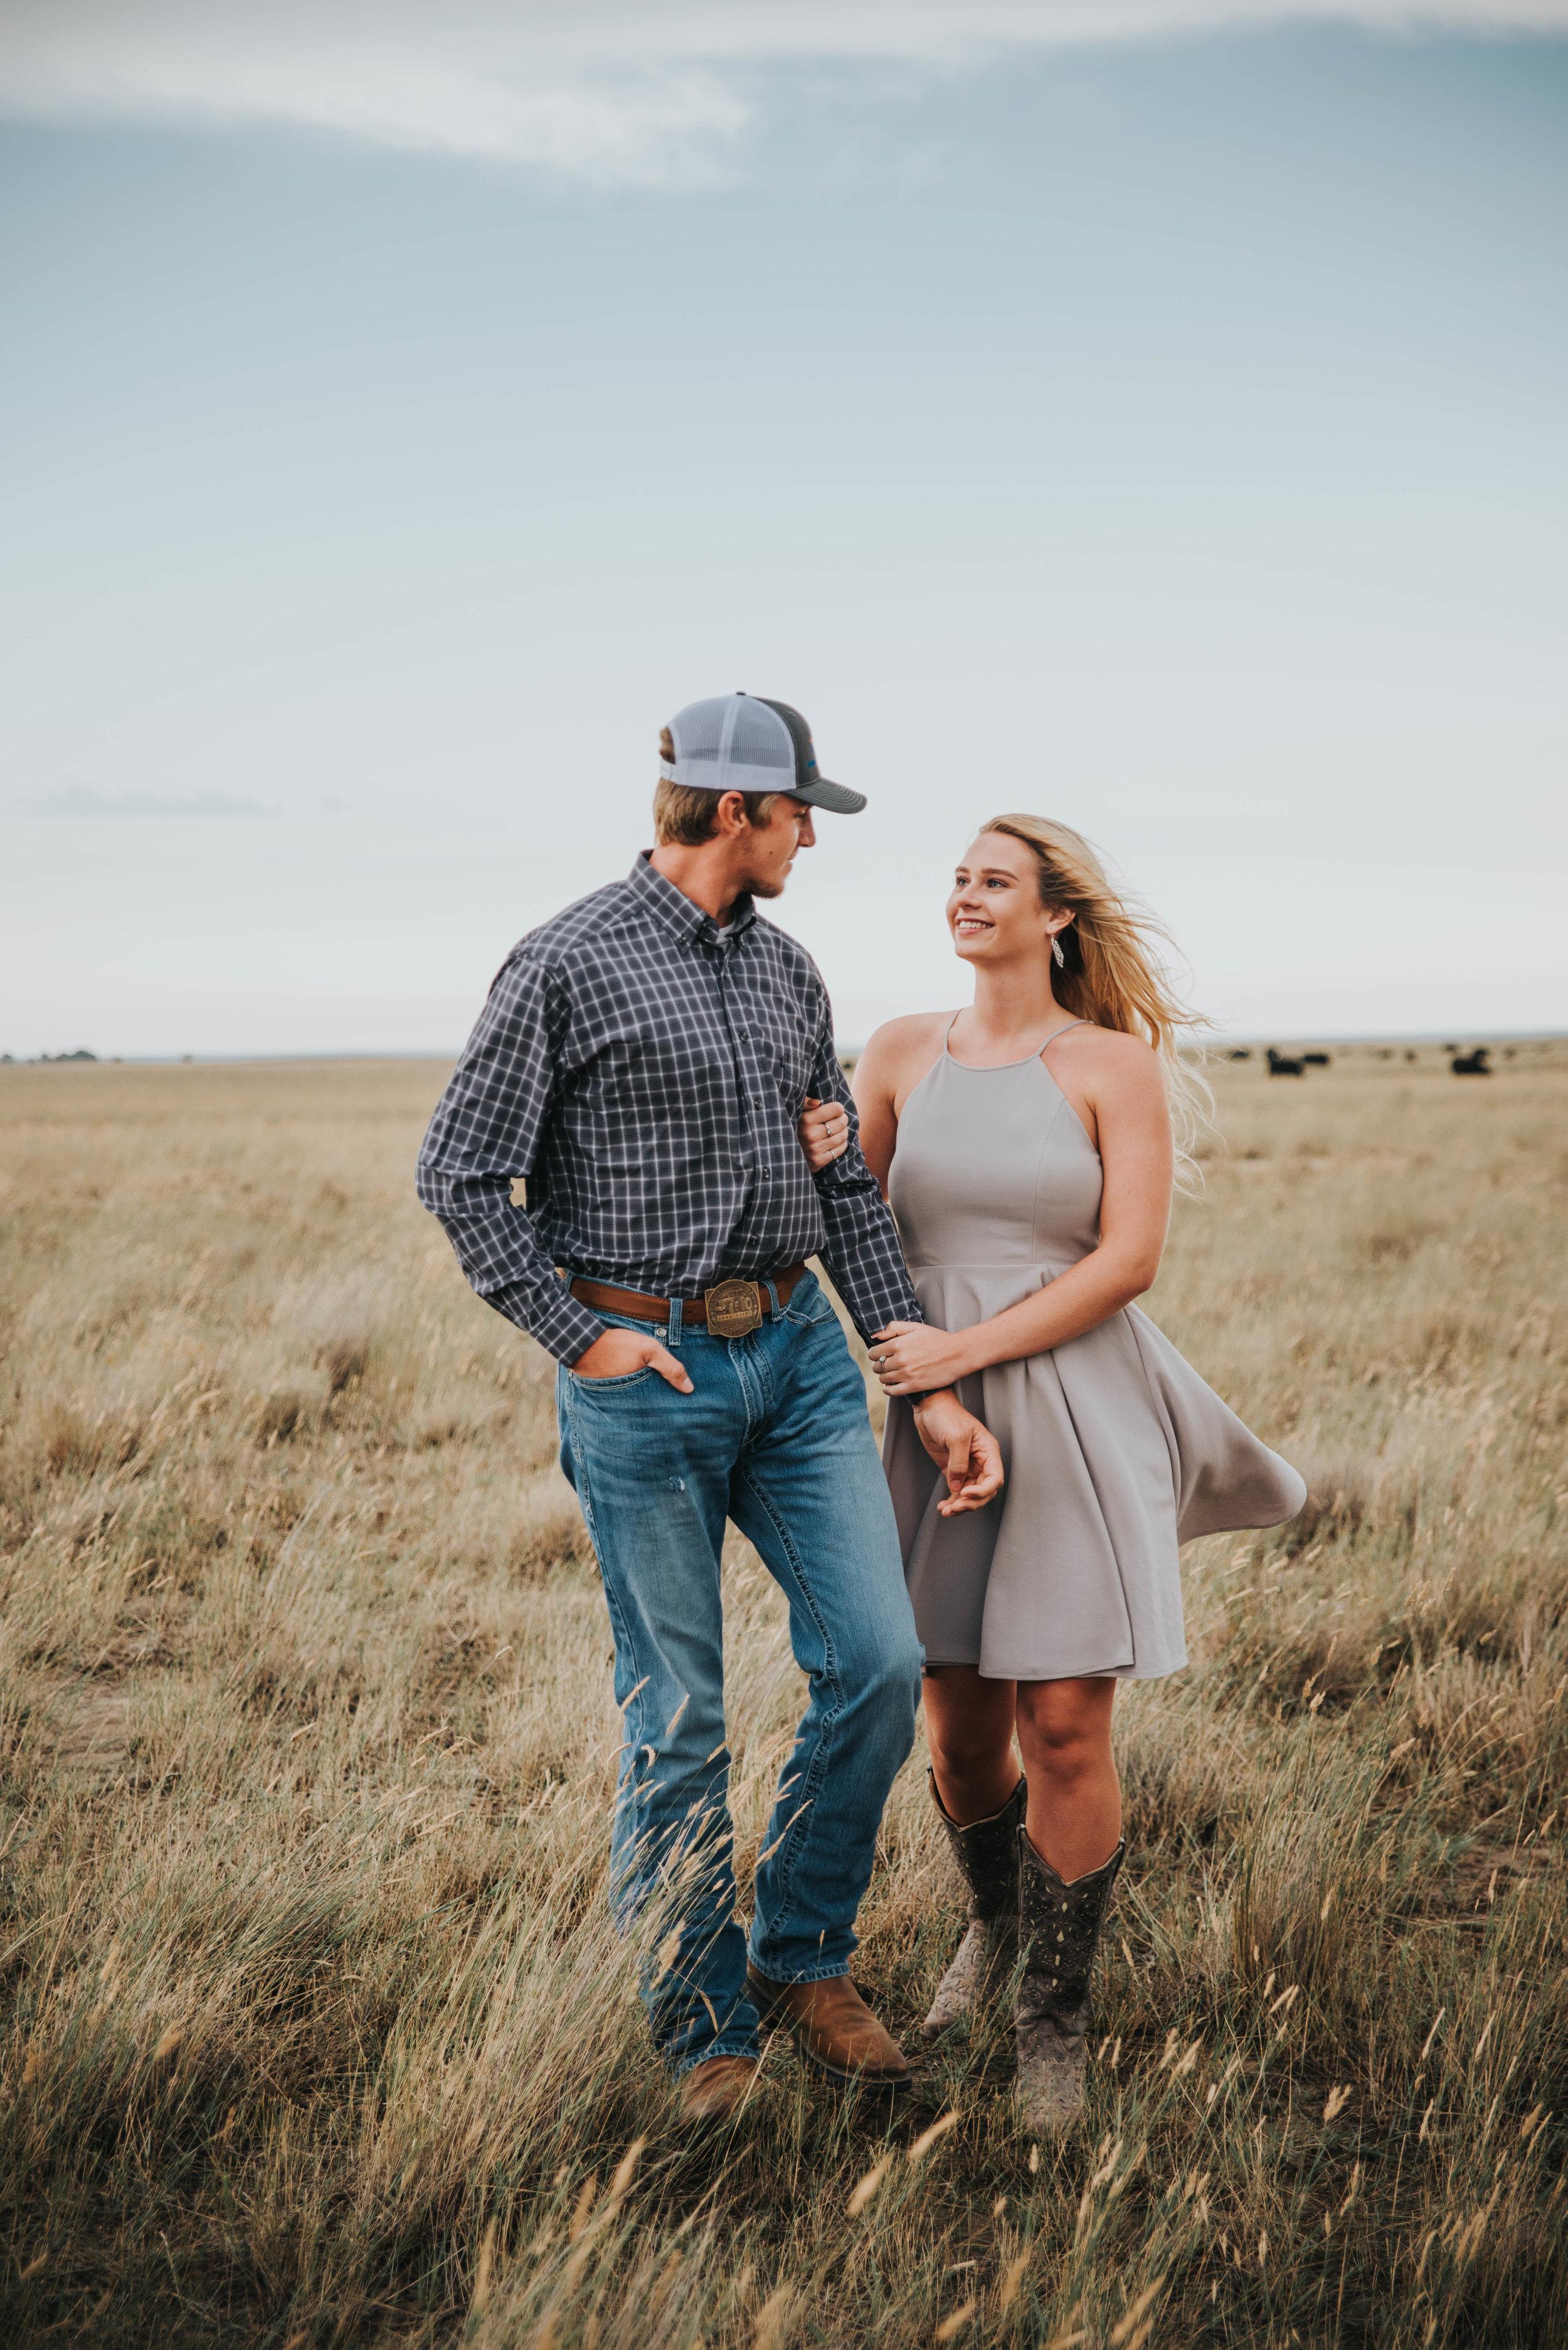 Miss. Miller's Photography | Colorado Wedding Photographer | Buckskin Bride | Western Engagement Photos | Country Engagement Photos | Country couples poses | Colorado Photographer | Looks Like Film | LuLus dresses | Ariat Jeans | Western Couple | Country Couple | Couples Photos | Engagement Inspiration